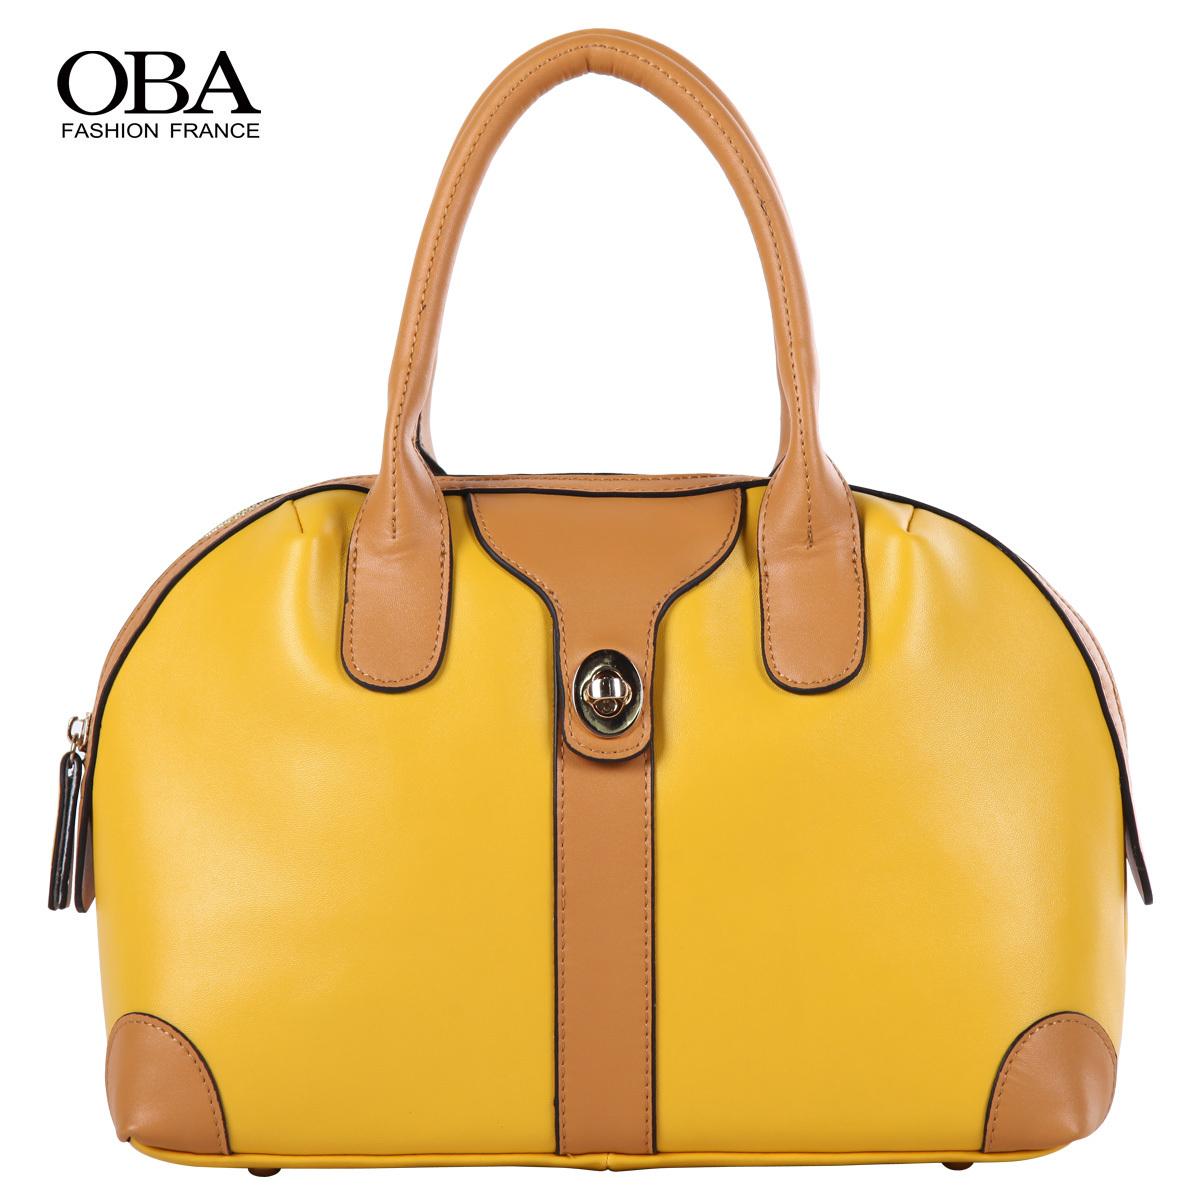 Oba women's handbag 2013 crescent moon bag formal color block leather bag messenger bag cosmetic bag 2198(China (Mainland))